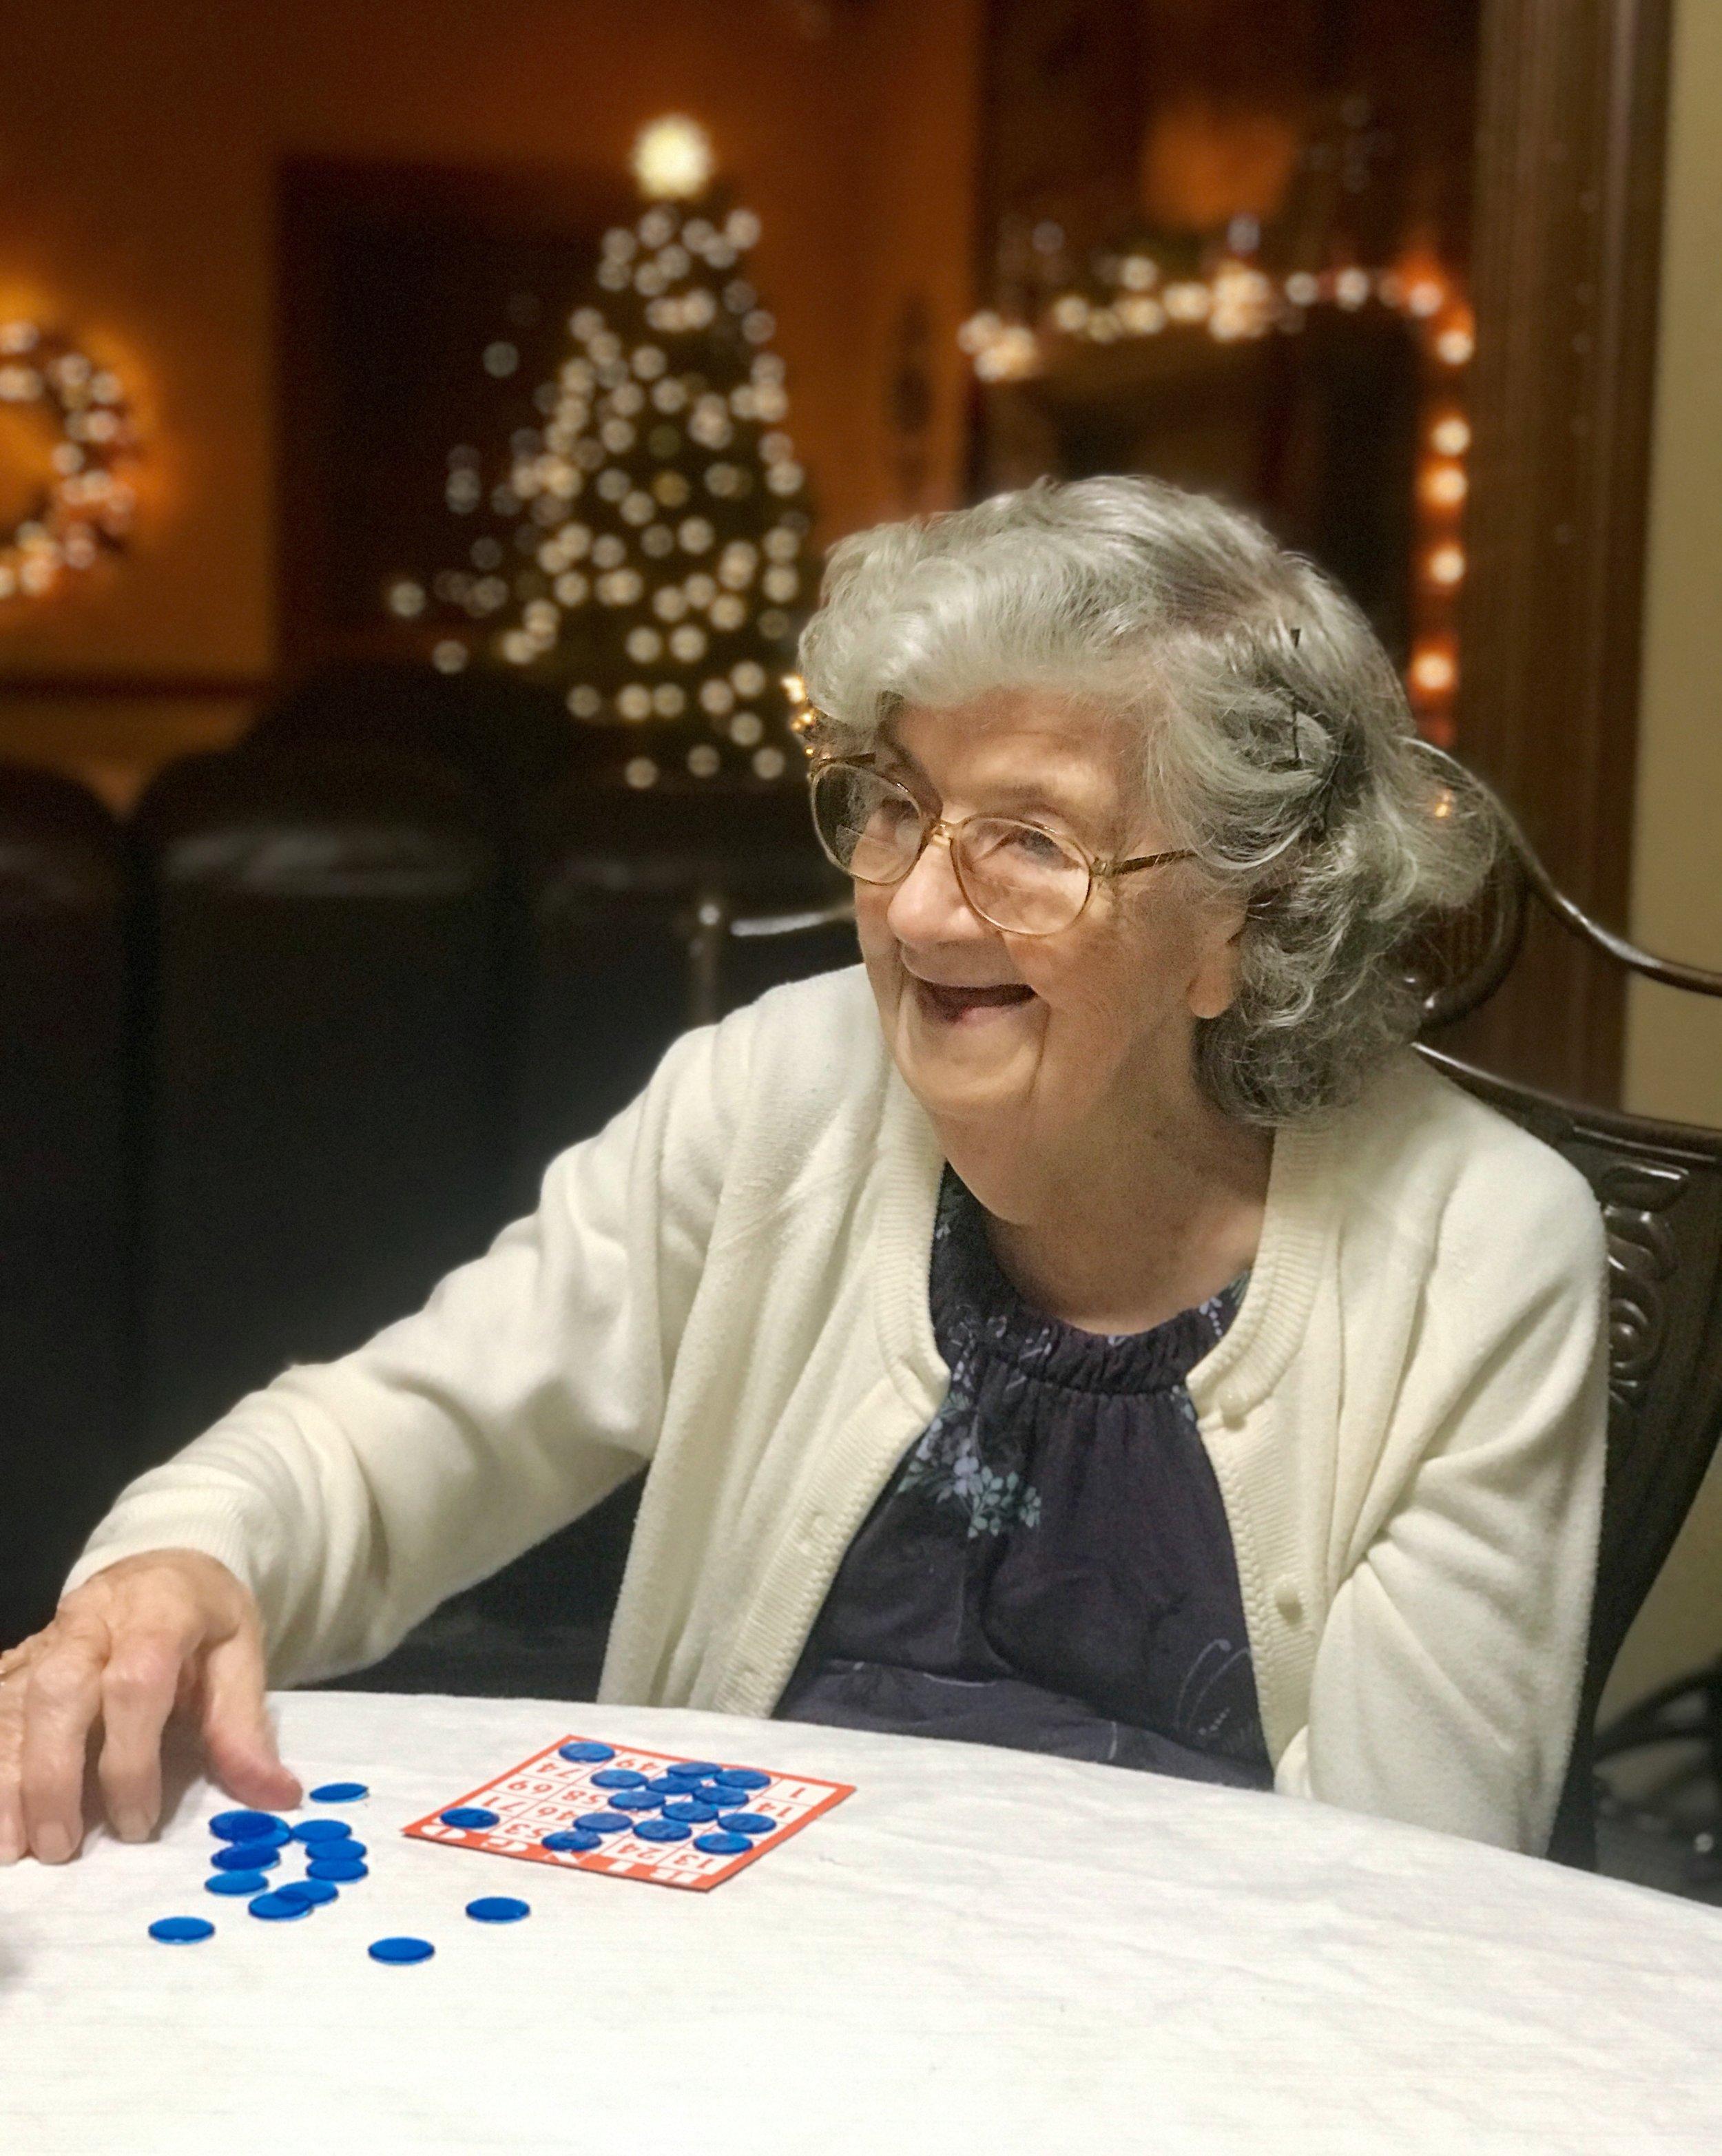 Christmas Grandma Bell | TetherAndFly.com